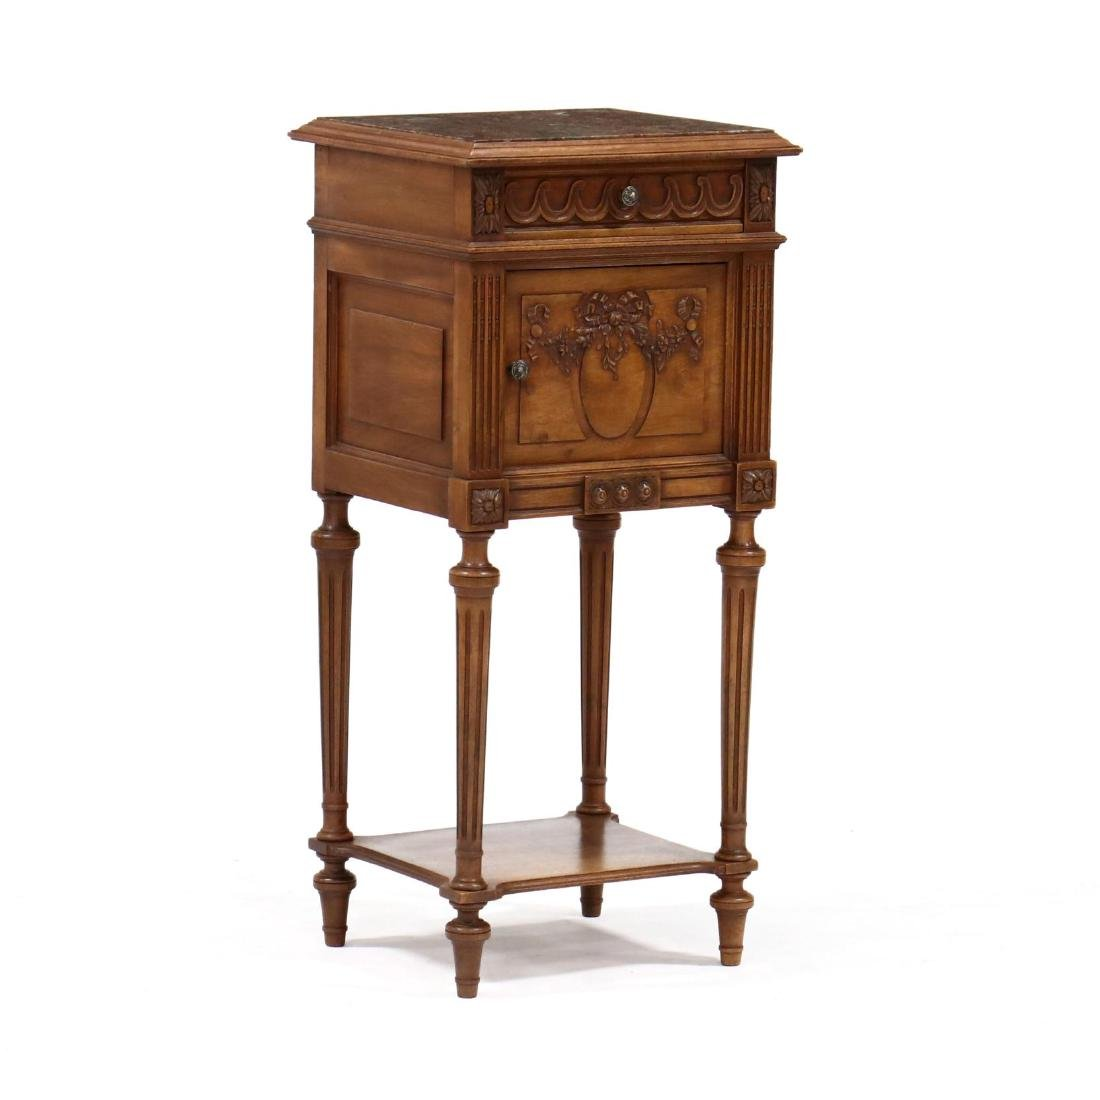 Louis XVI Style Marble Top Smoking Stand